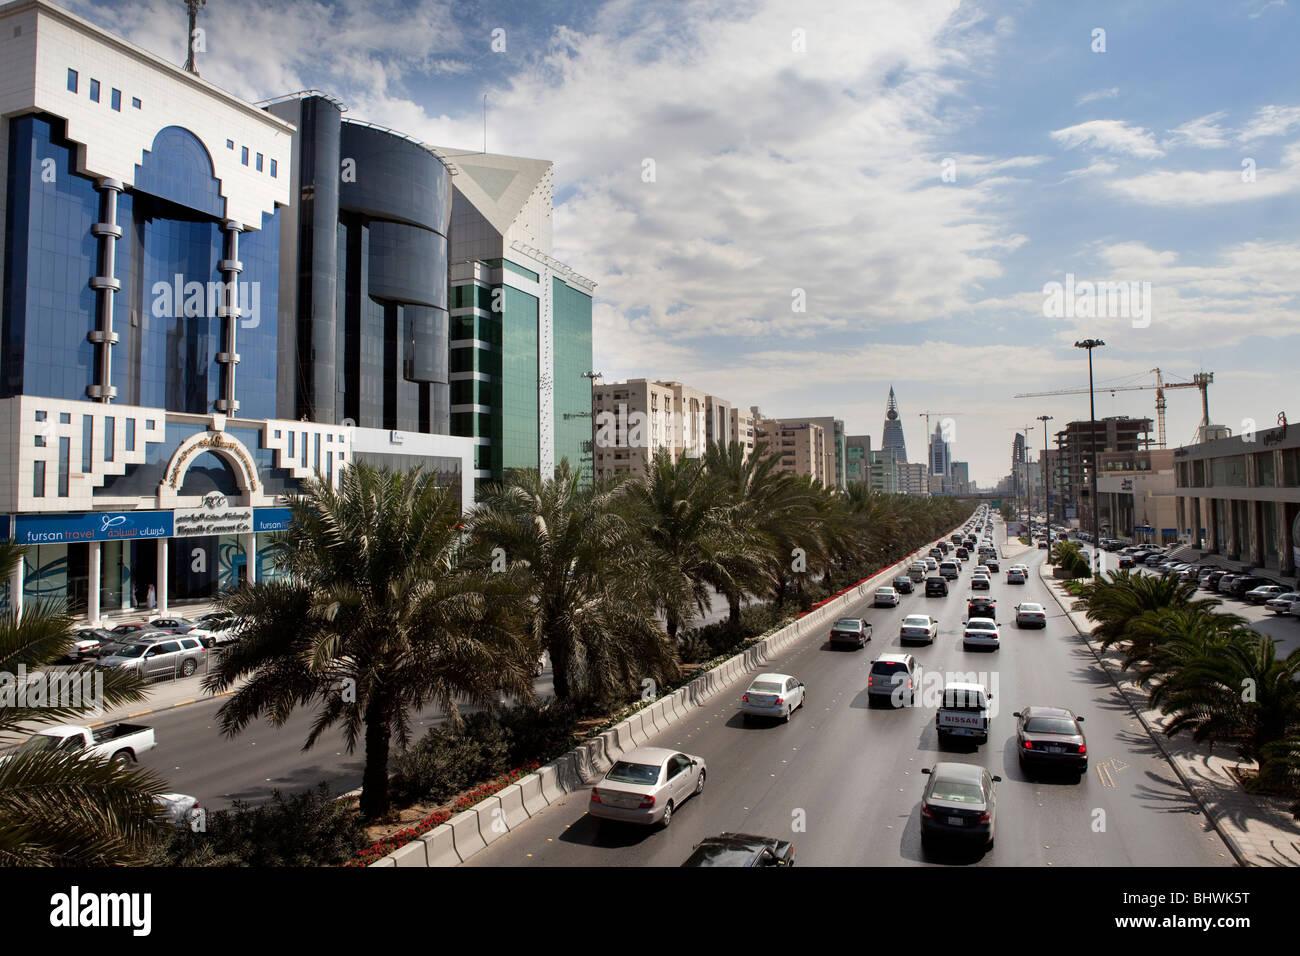 Il traffico su strada trafficata Riyadh Saudi Arabia Immagini Stock